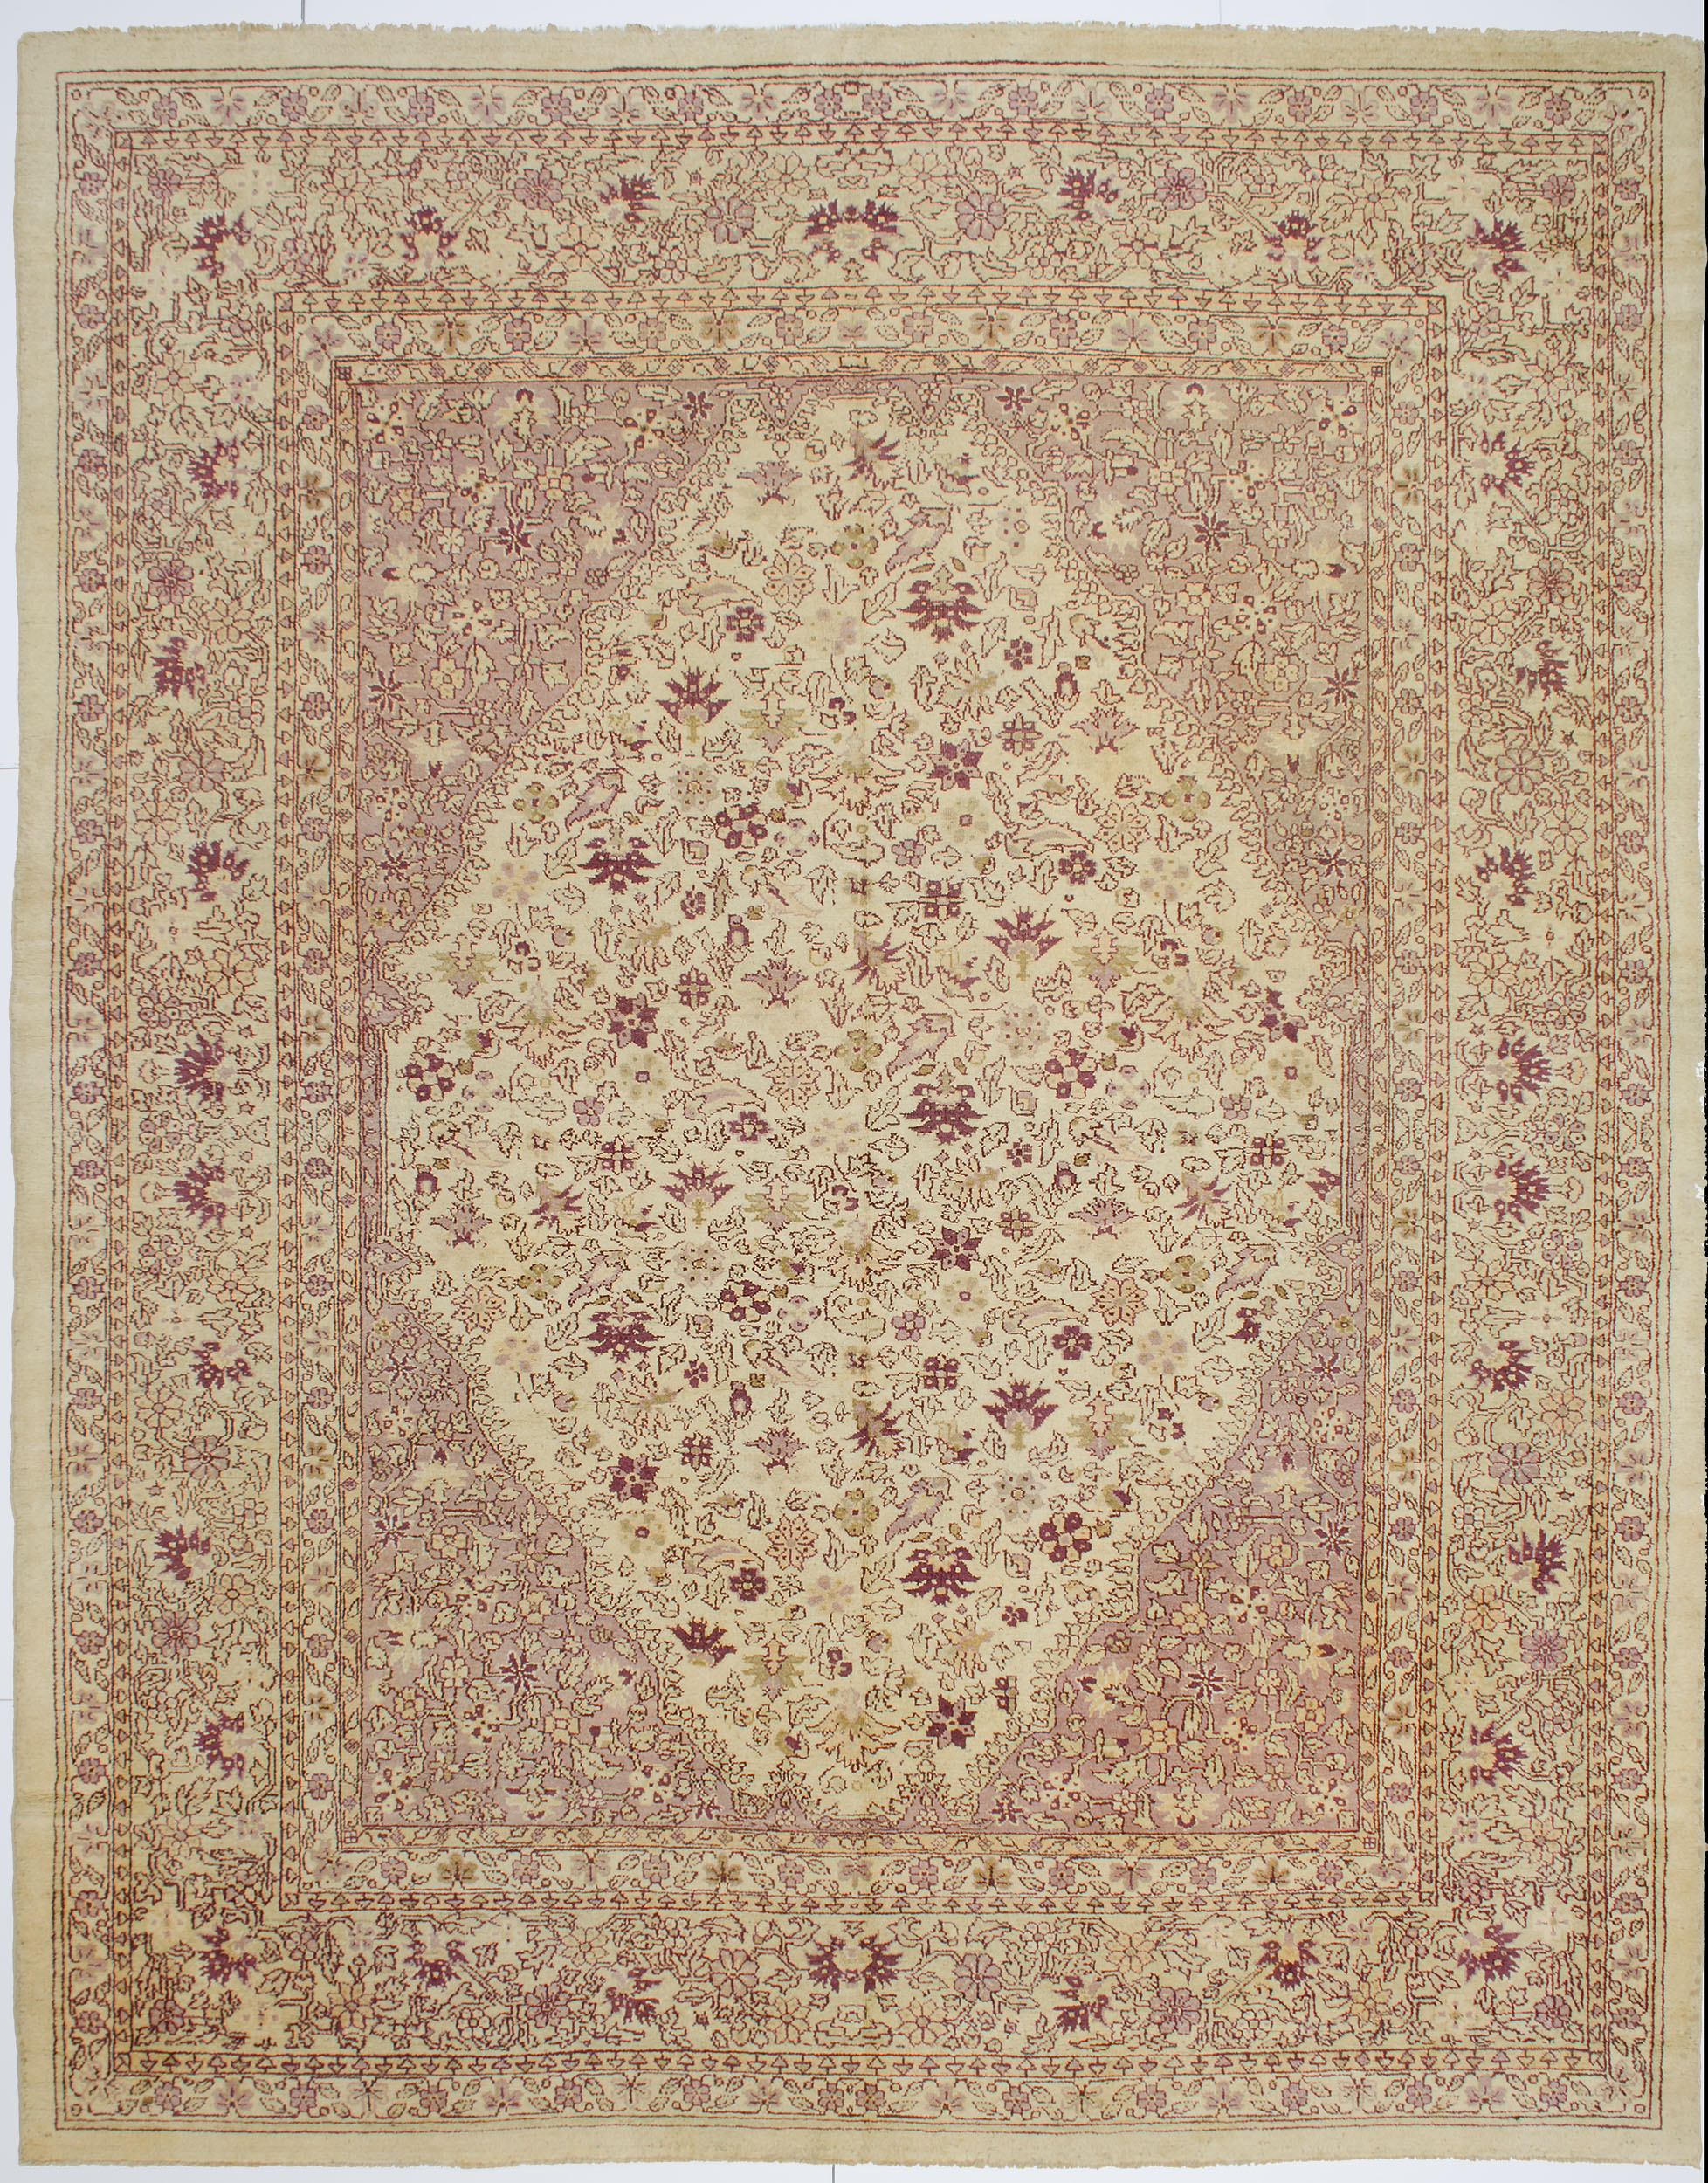 "Copy of Amritsar Carpet 11' 7"" x 9' 0"""